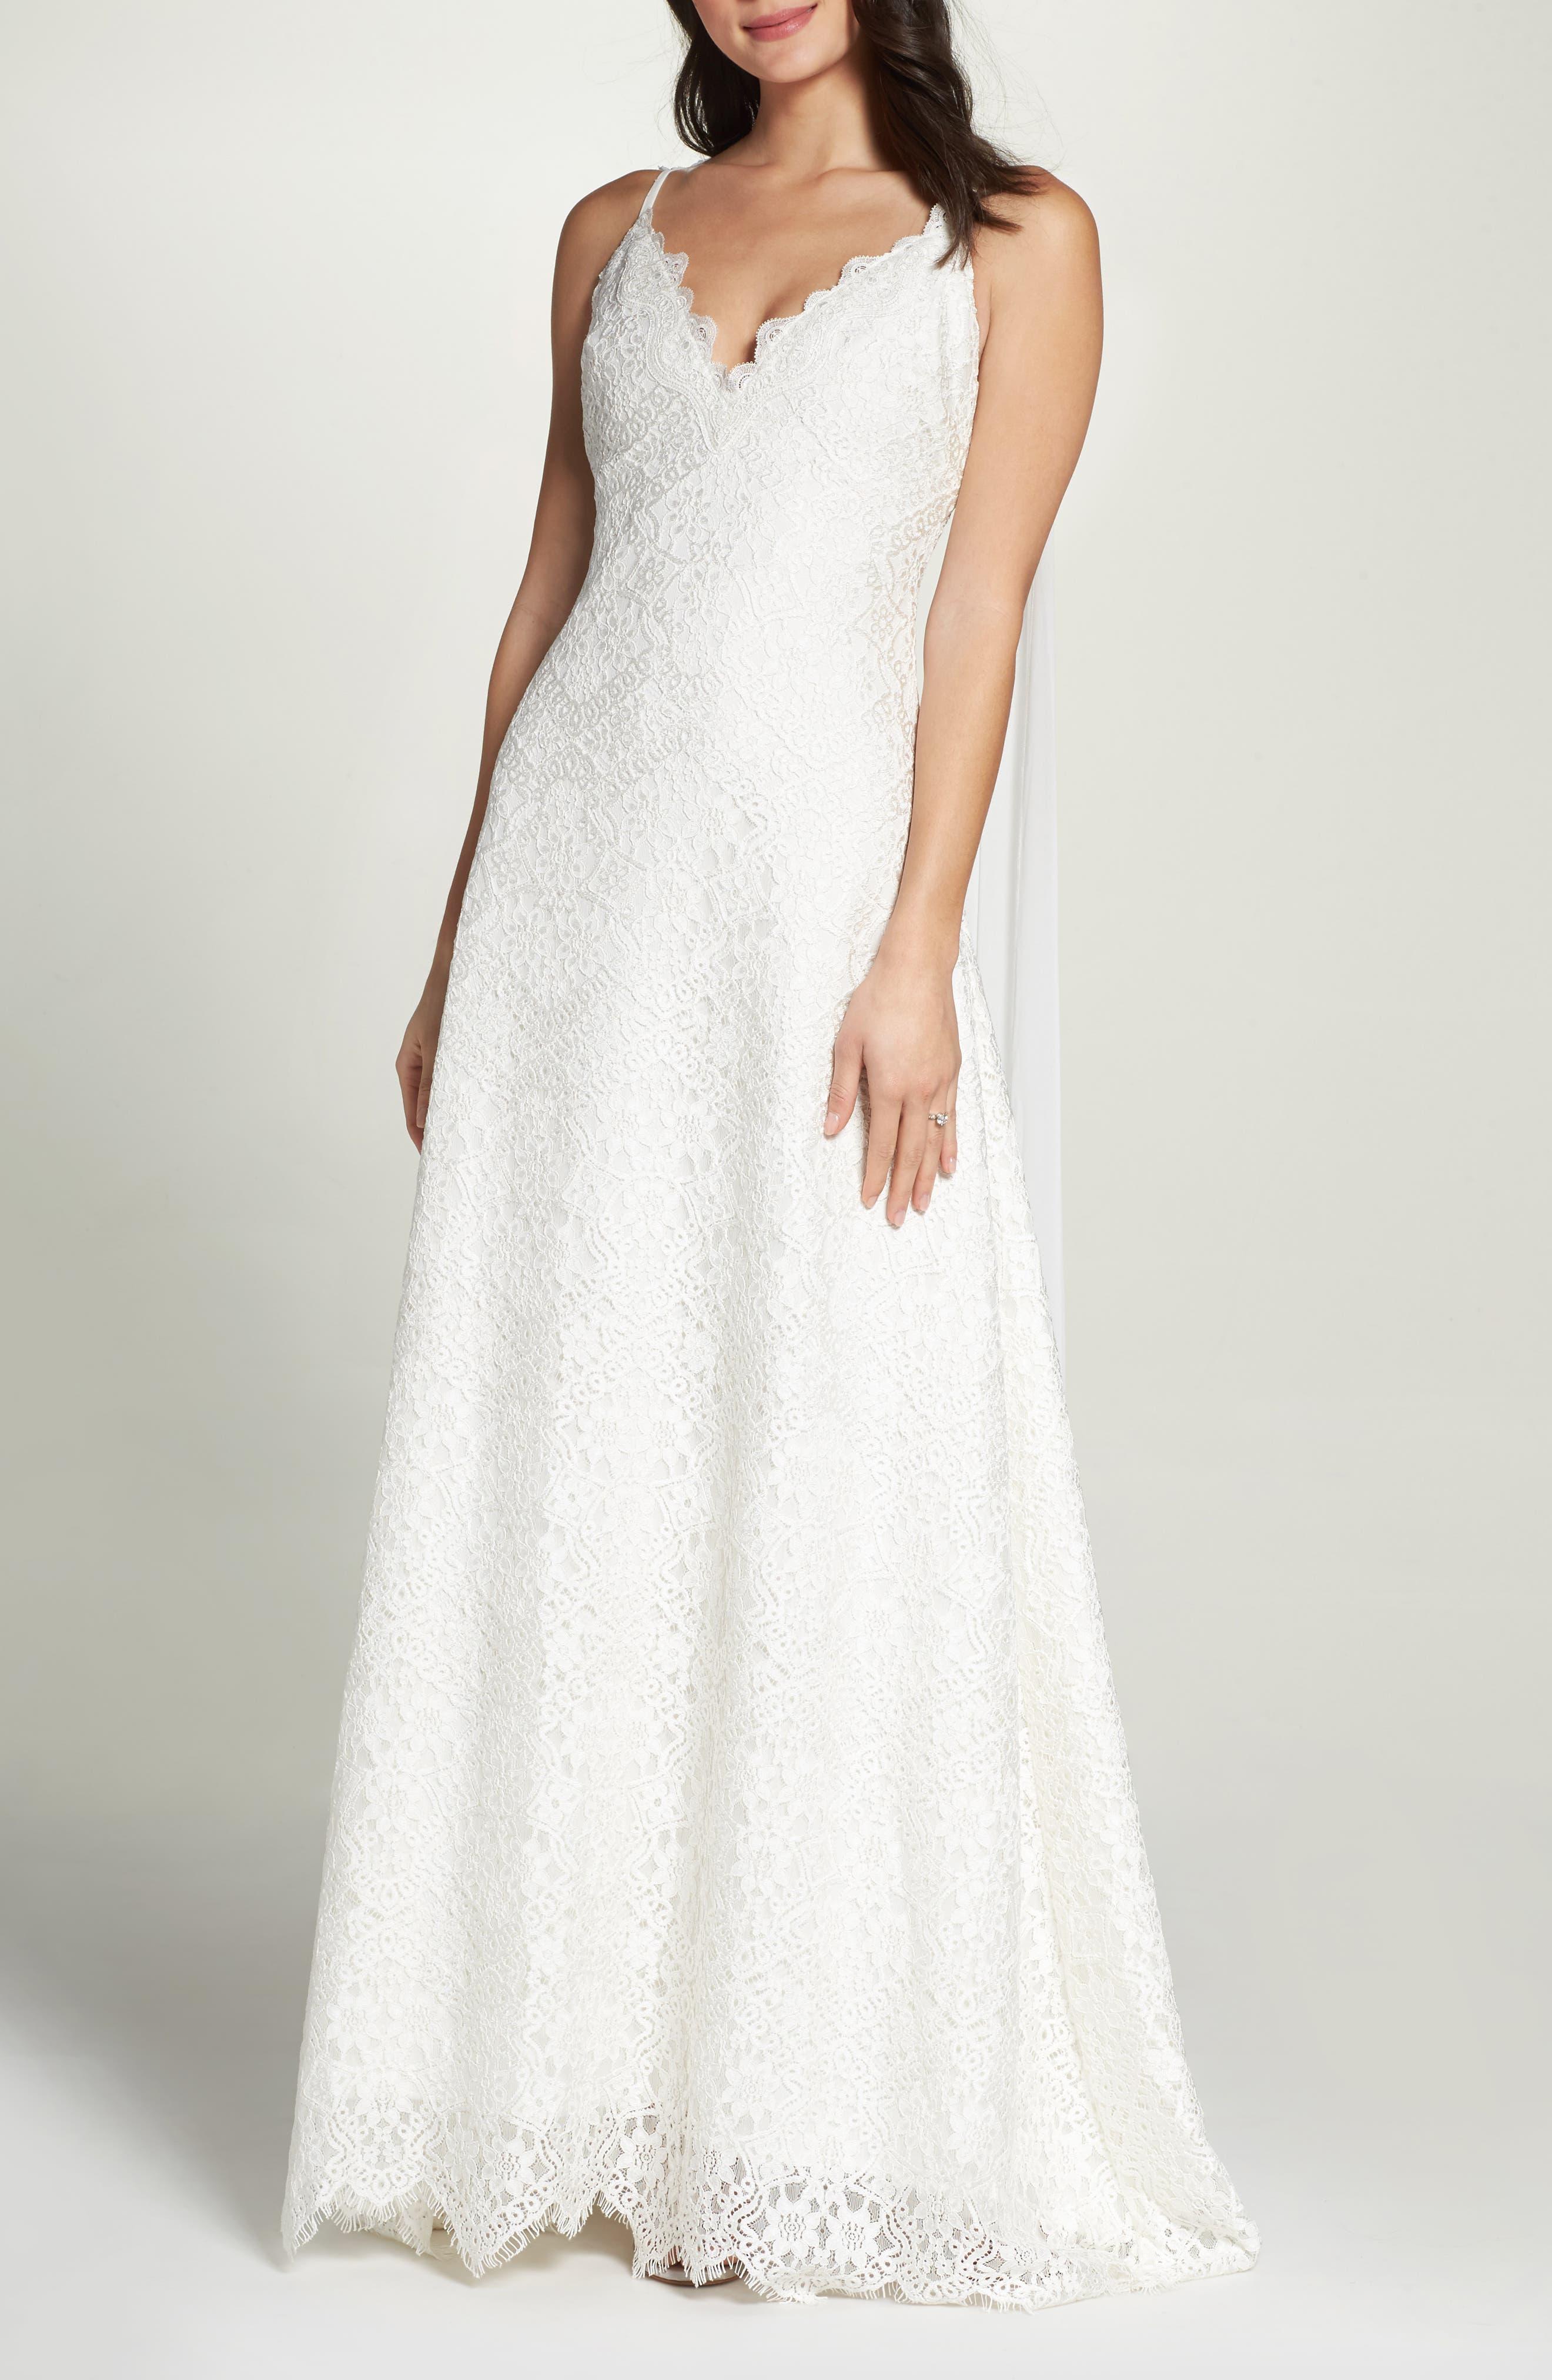 Chiffon Sash Scalloped Lace Gown,                         Main,                         color, 900